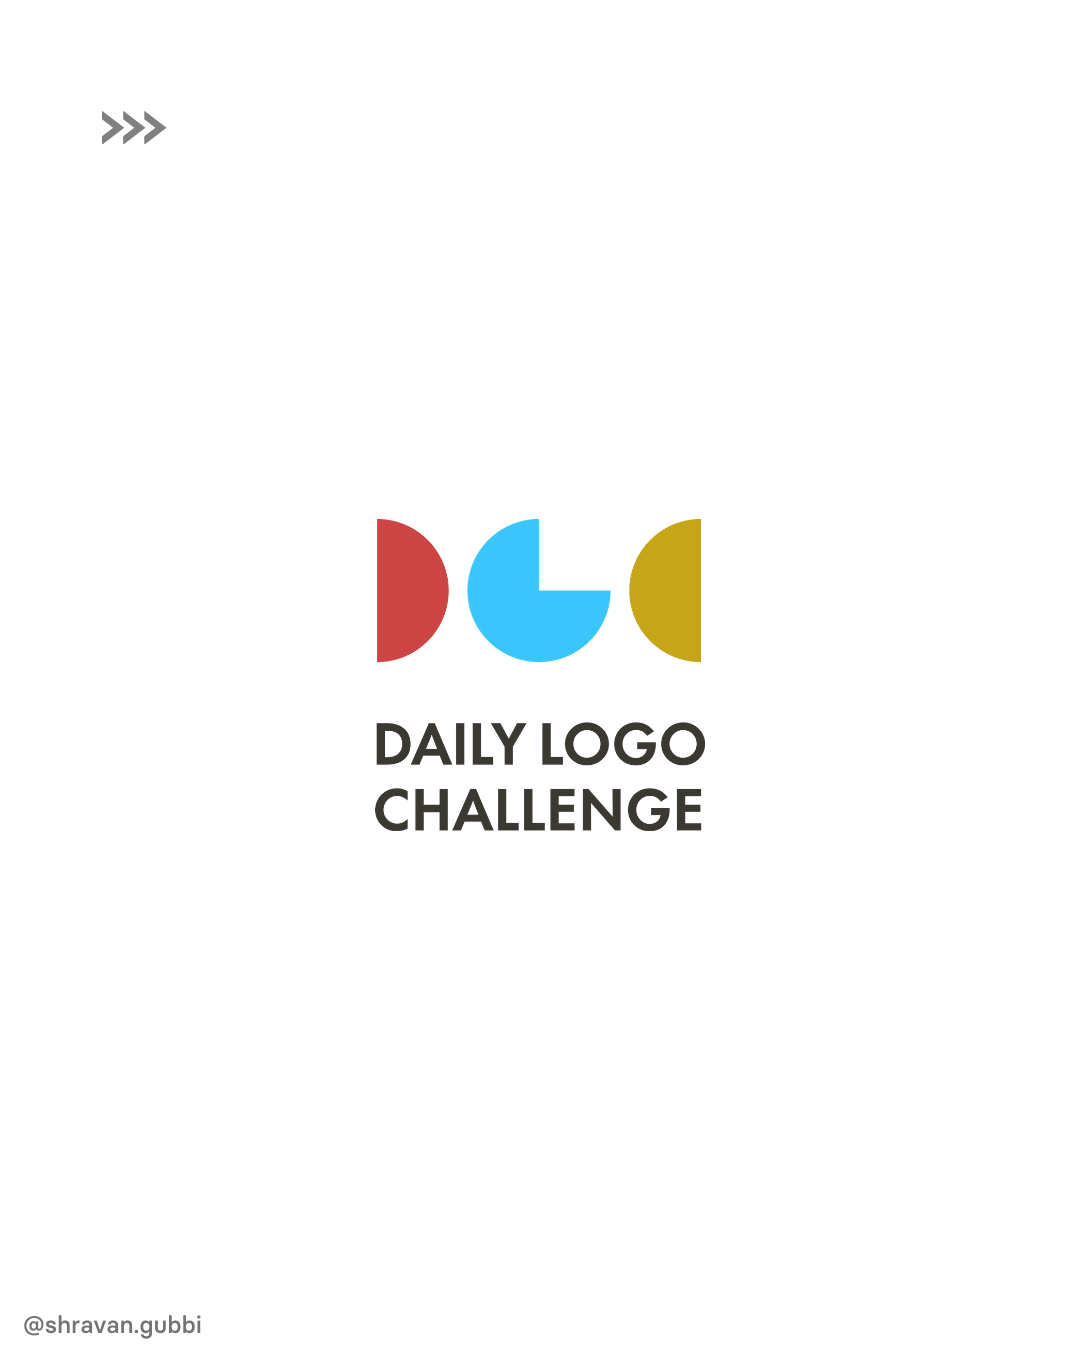 Shravan_gubbi_Daily_Logo_Challenge_logo_1